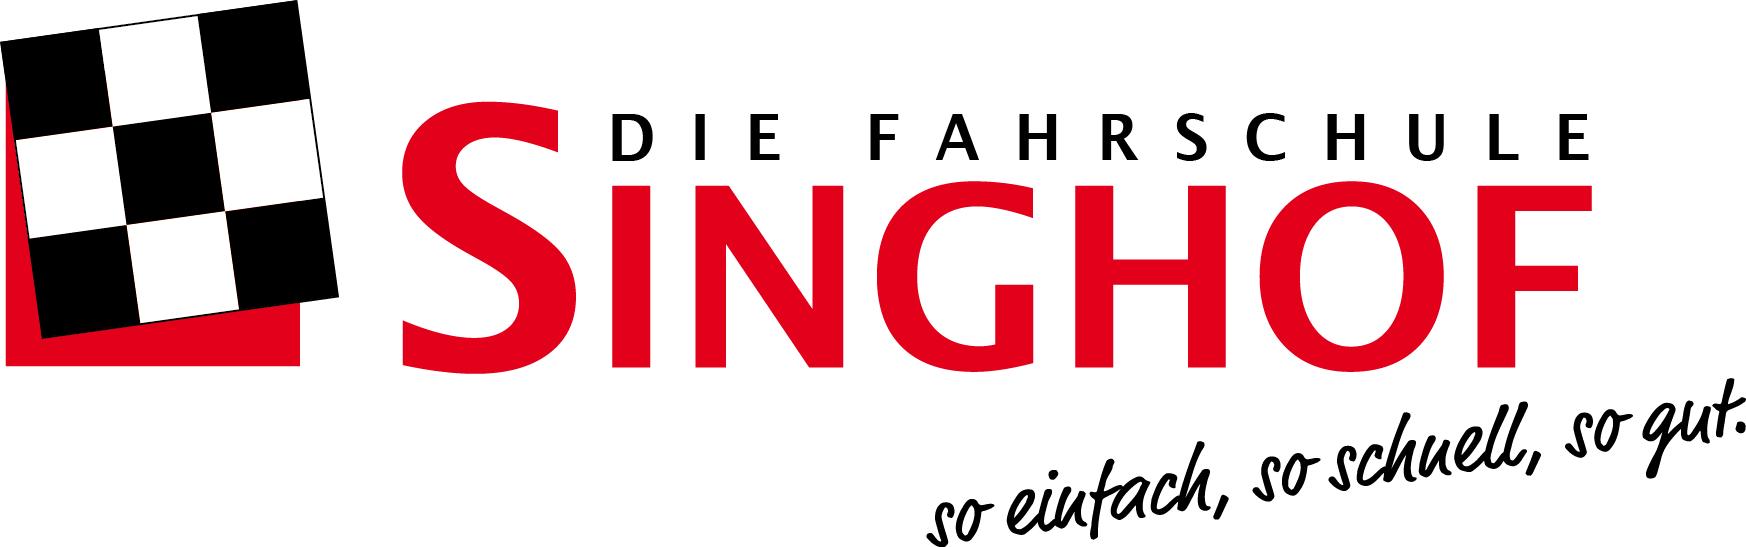 Fahrschule Singhof GmbH